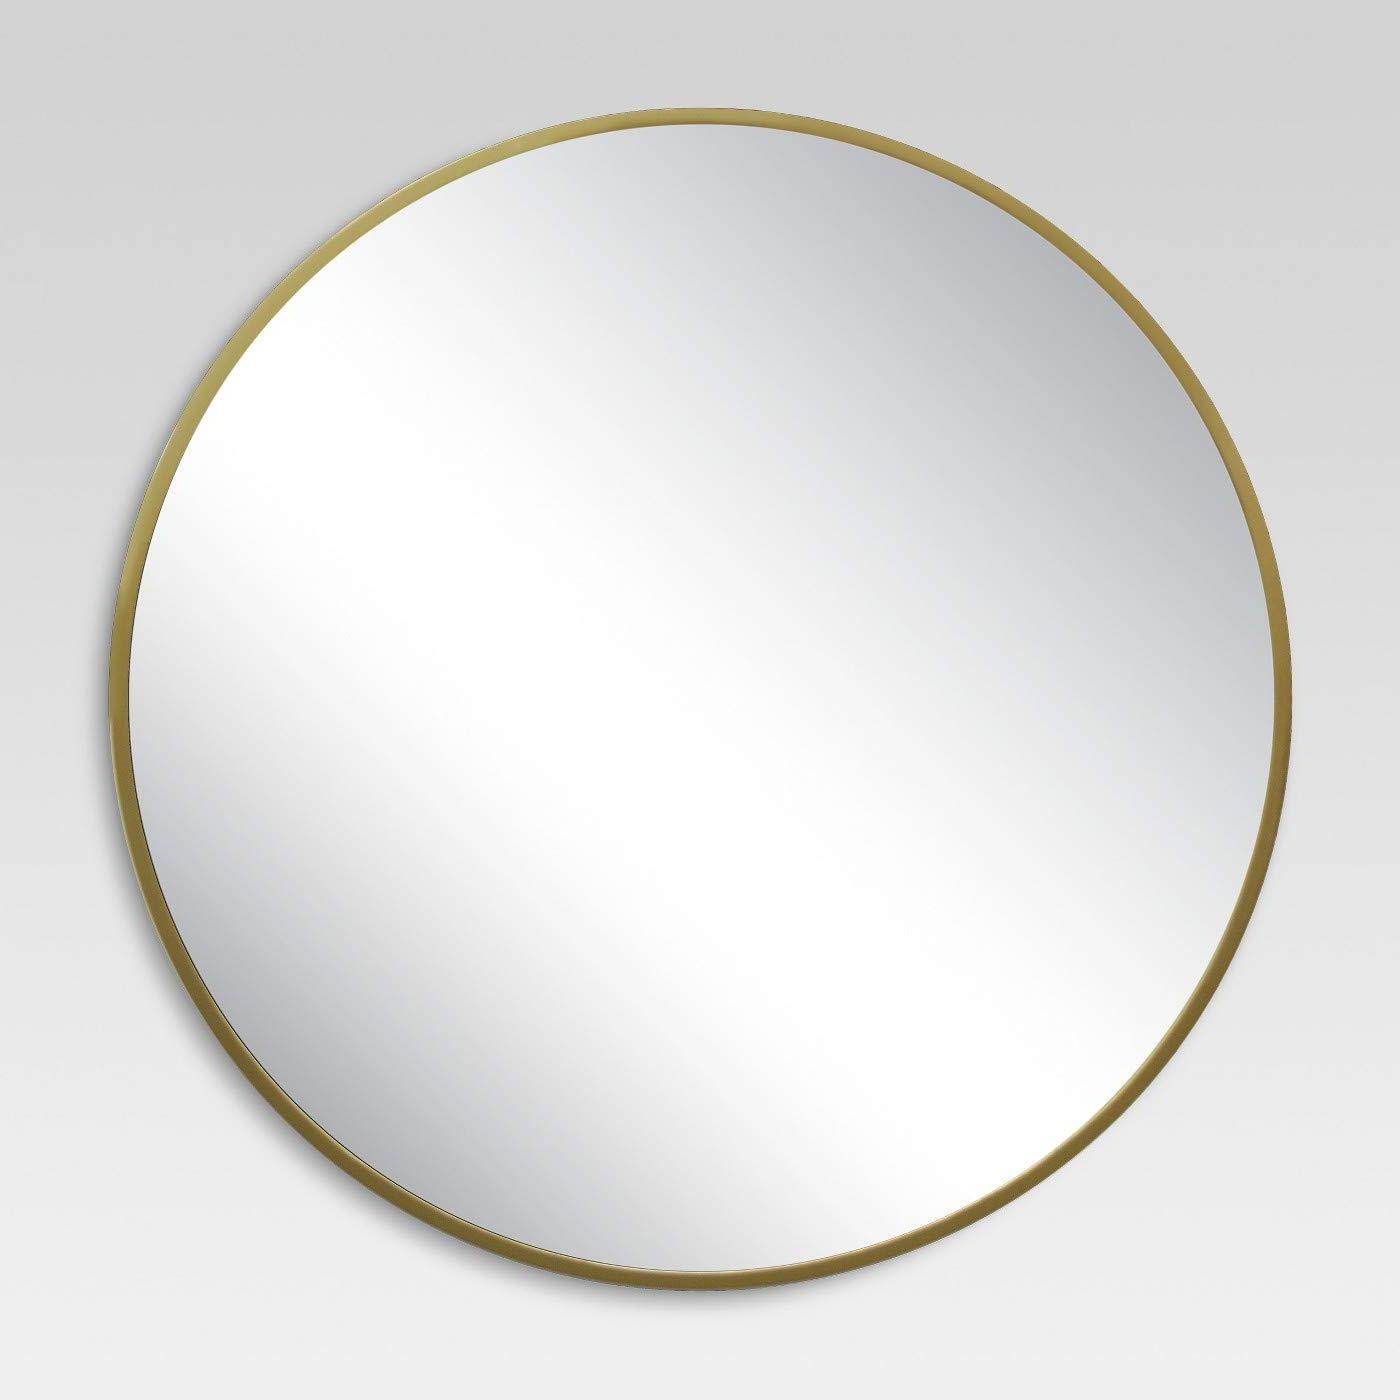 Famous Round Decorative Wall Mirrors Regarding Round Decorative Wall Mirror Brass – Project (View 13 of 20)